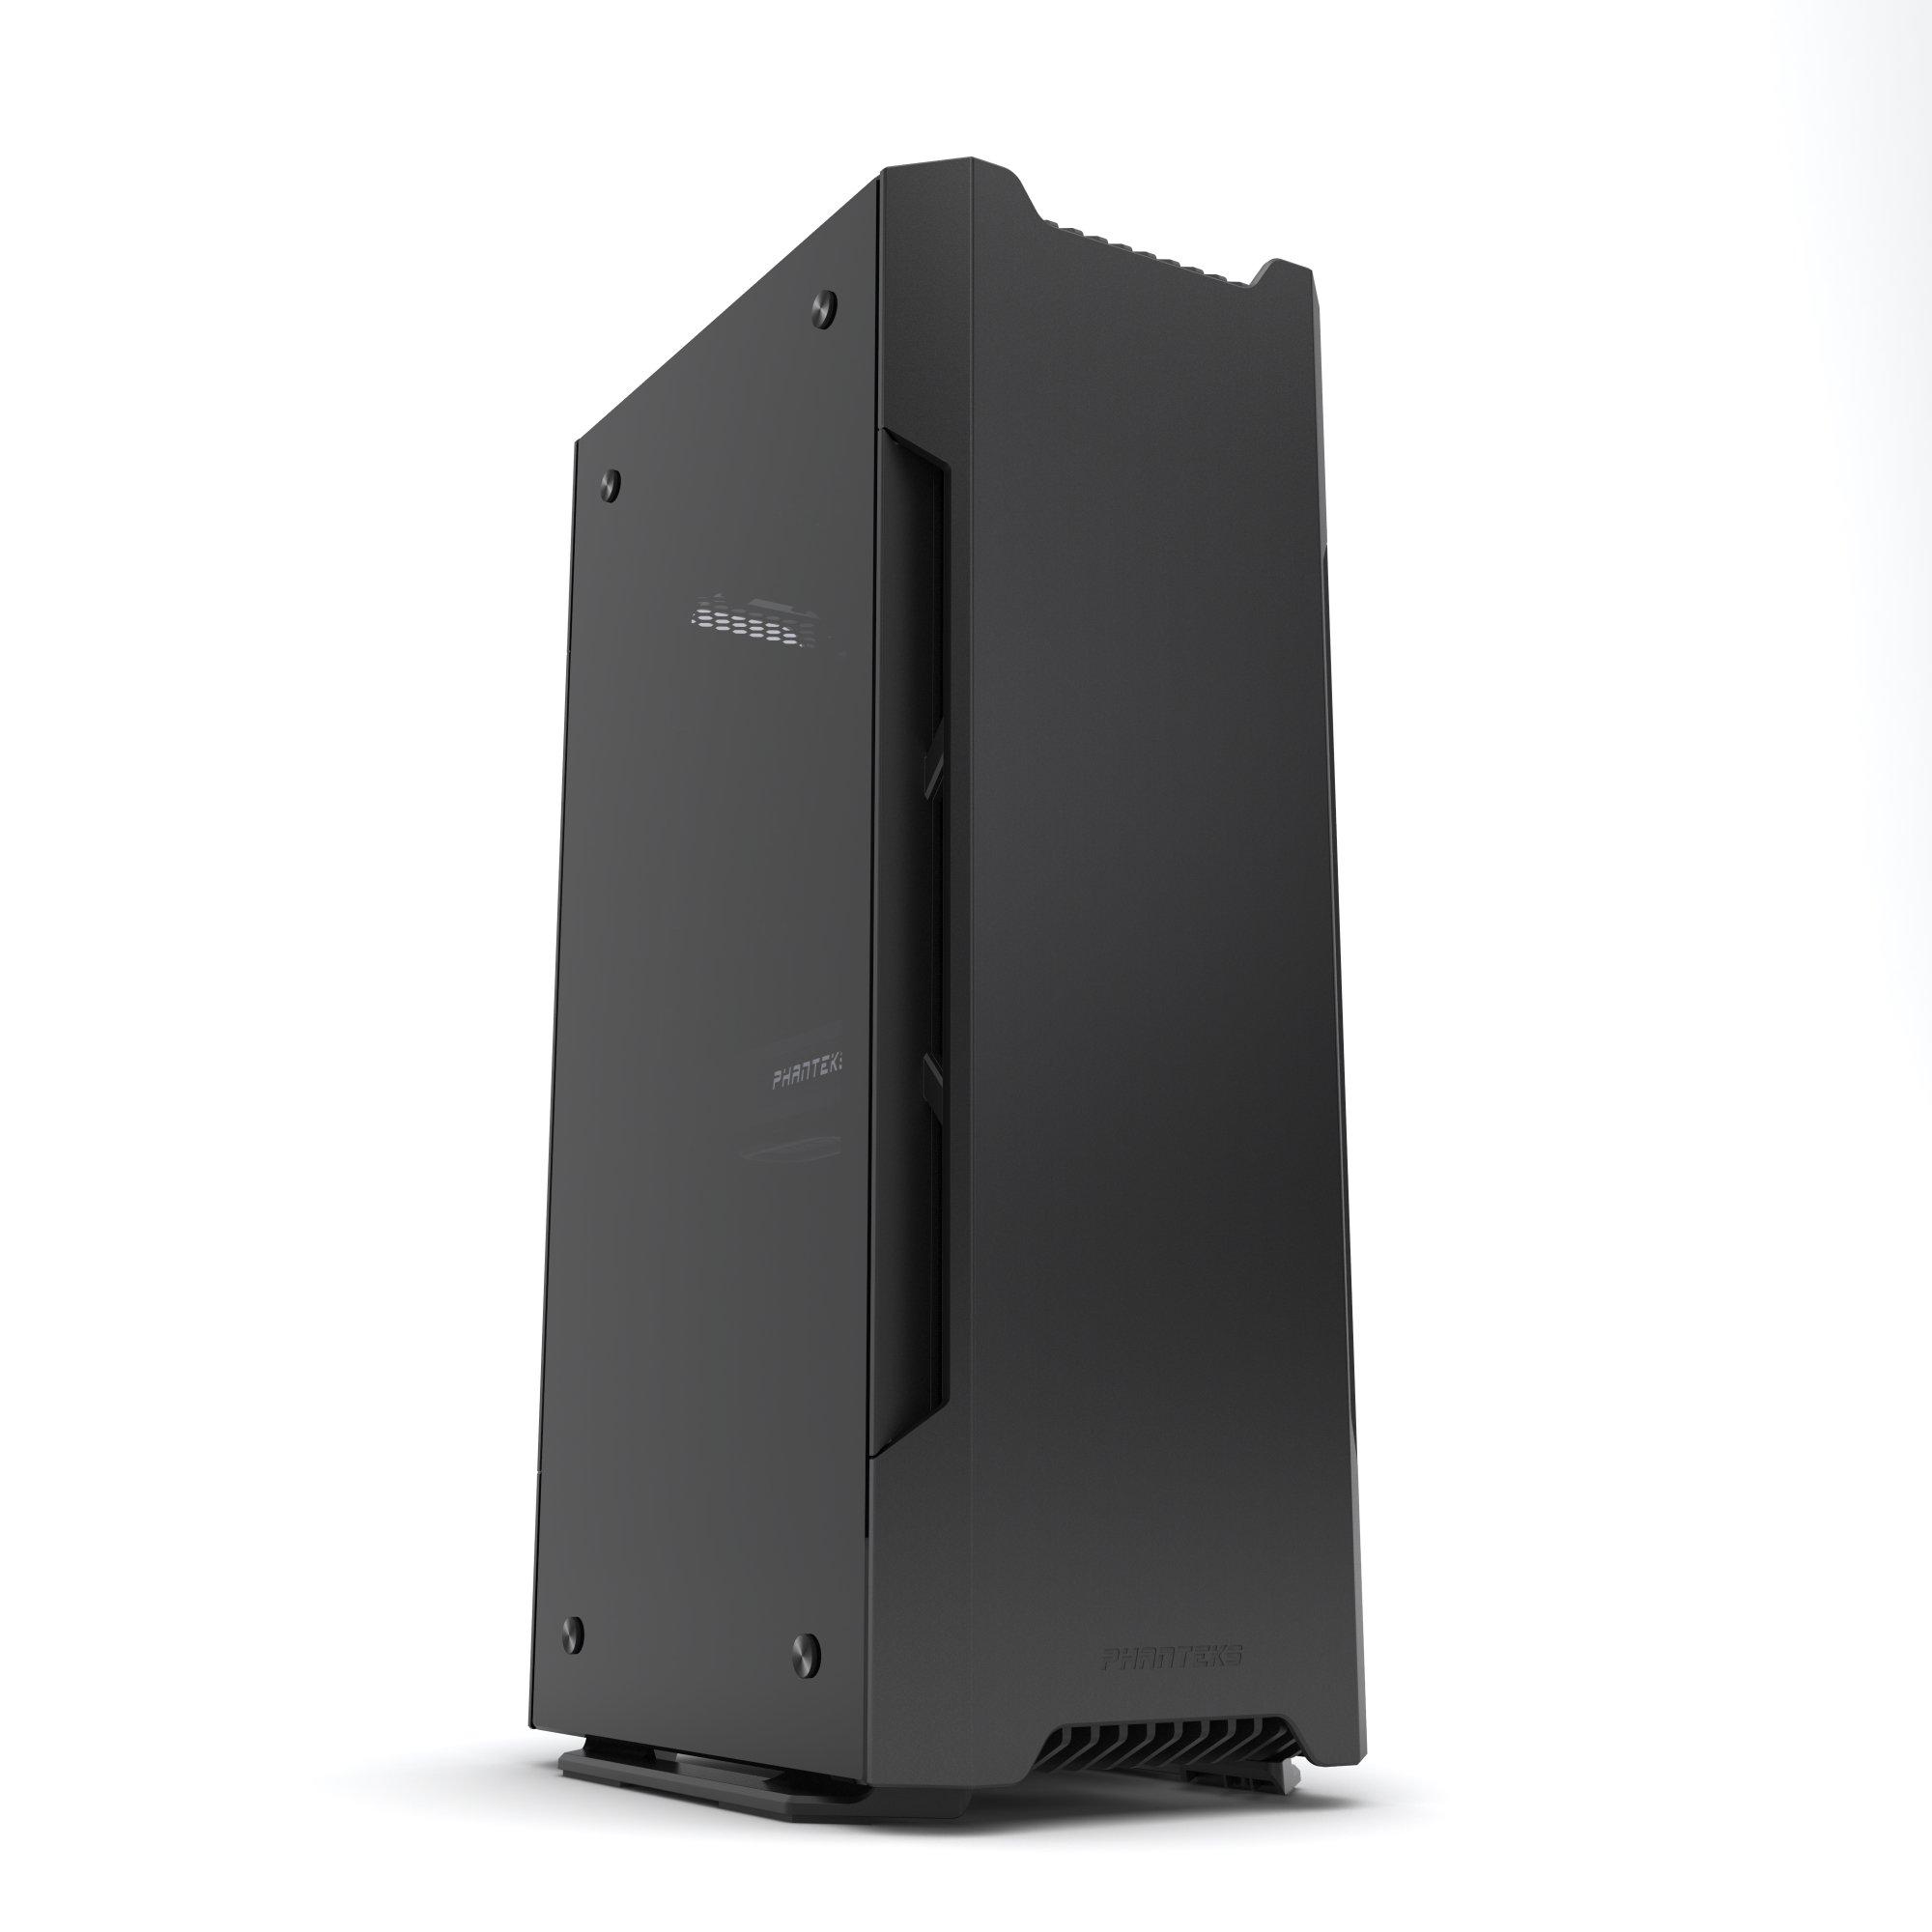 Phanteks Evolv Shift Mini ITX Case Small Footprint Multiple Orientations 360-Degrees of Accessibility Vertical Airflow Cases PH-ES217E_BK Black